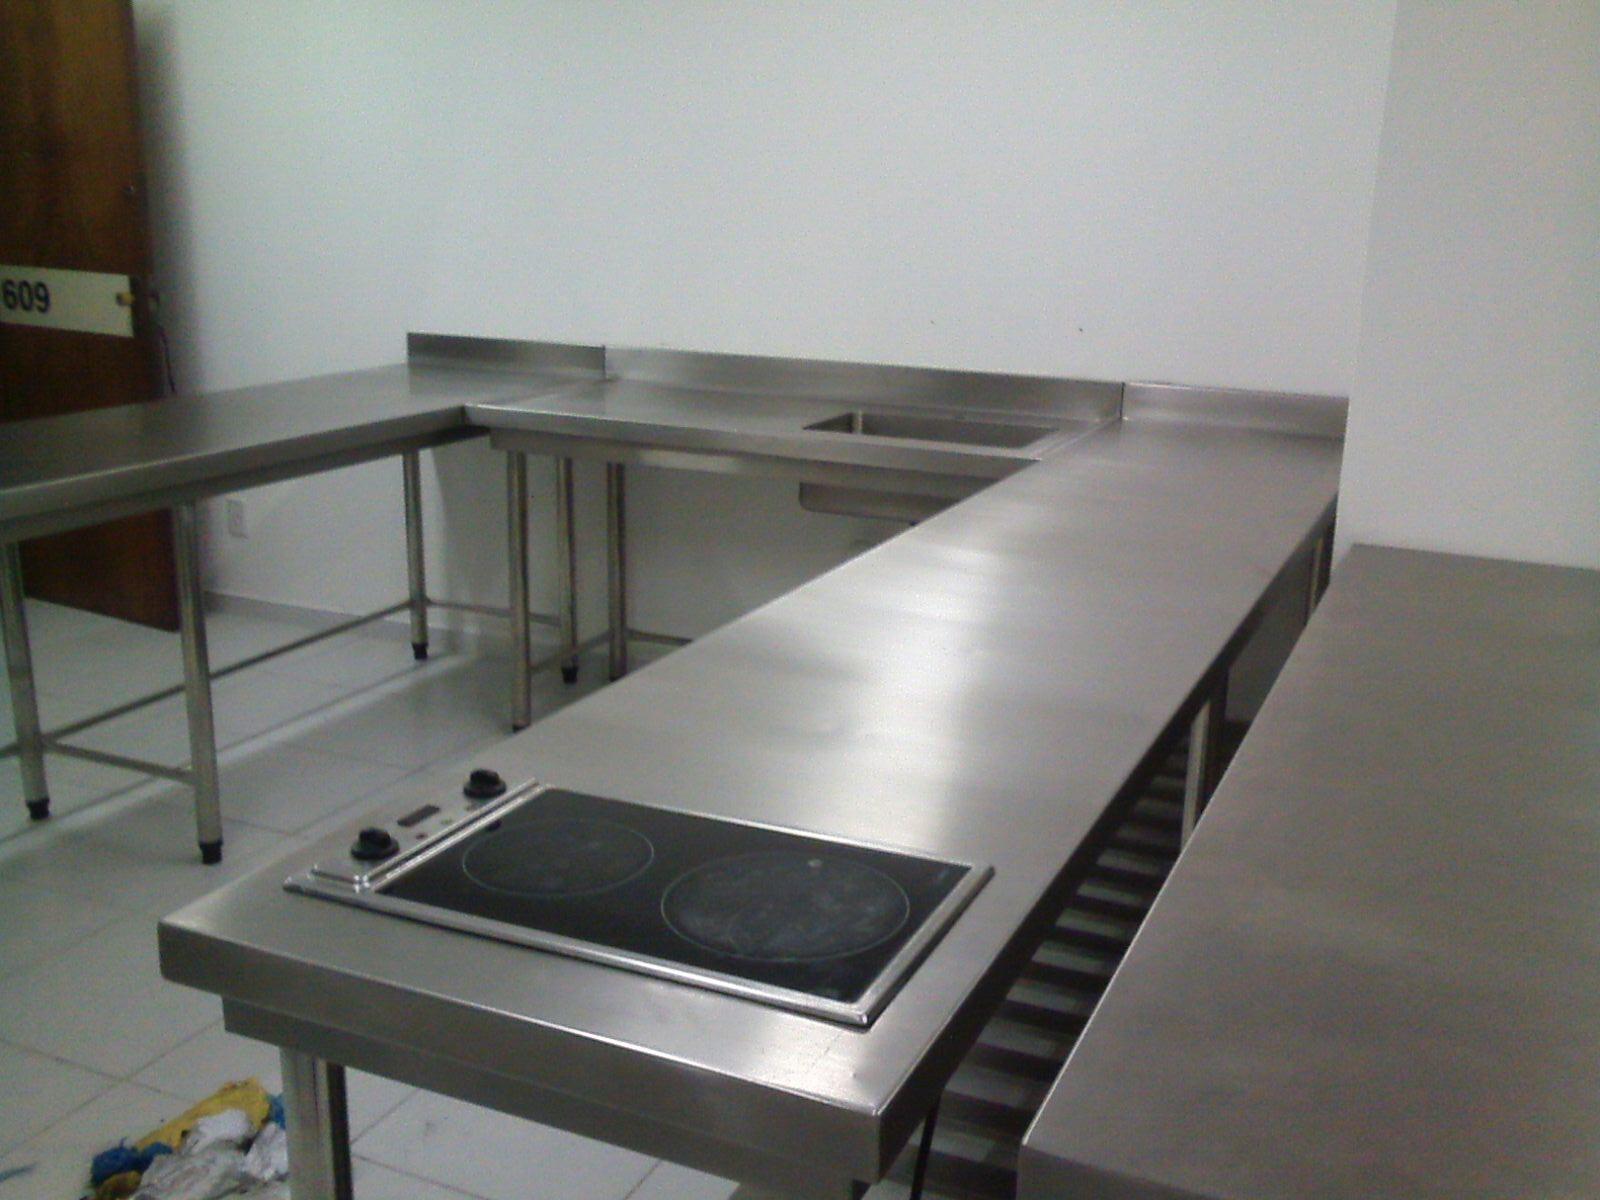 Mesa Com Cooktop Embutido